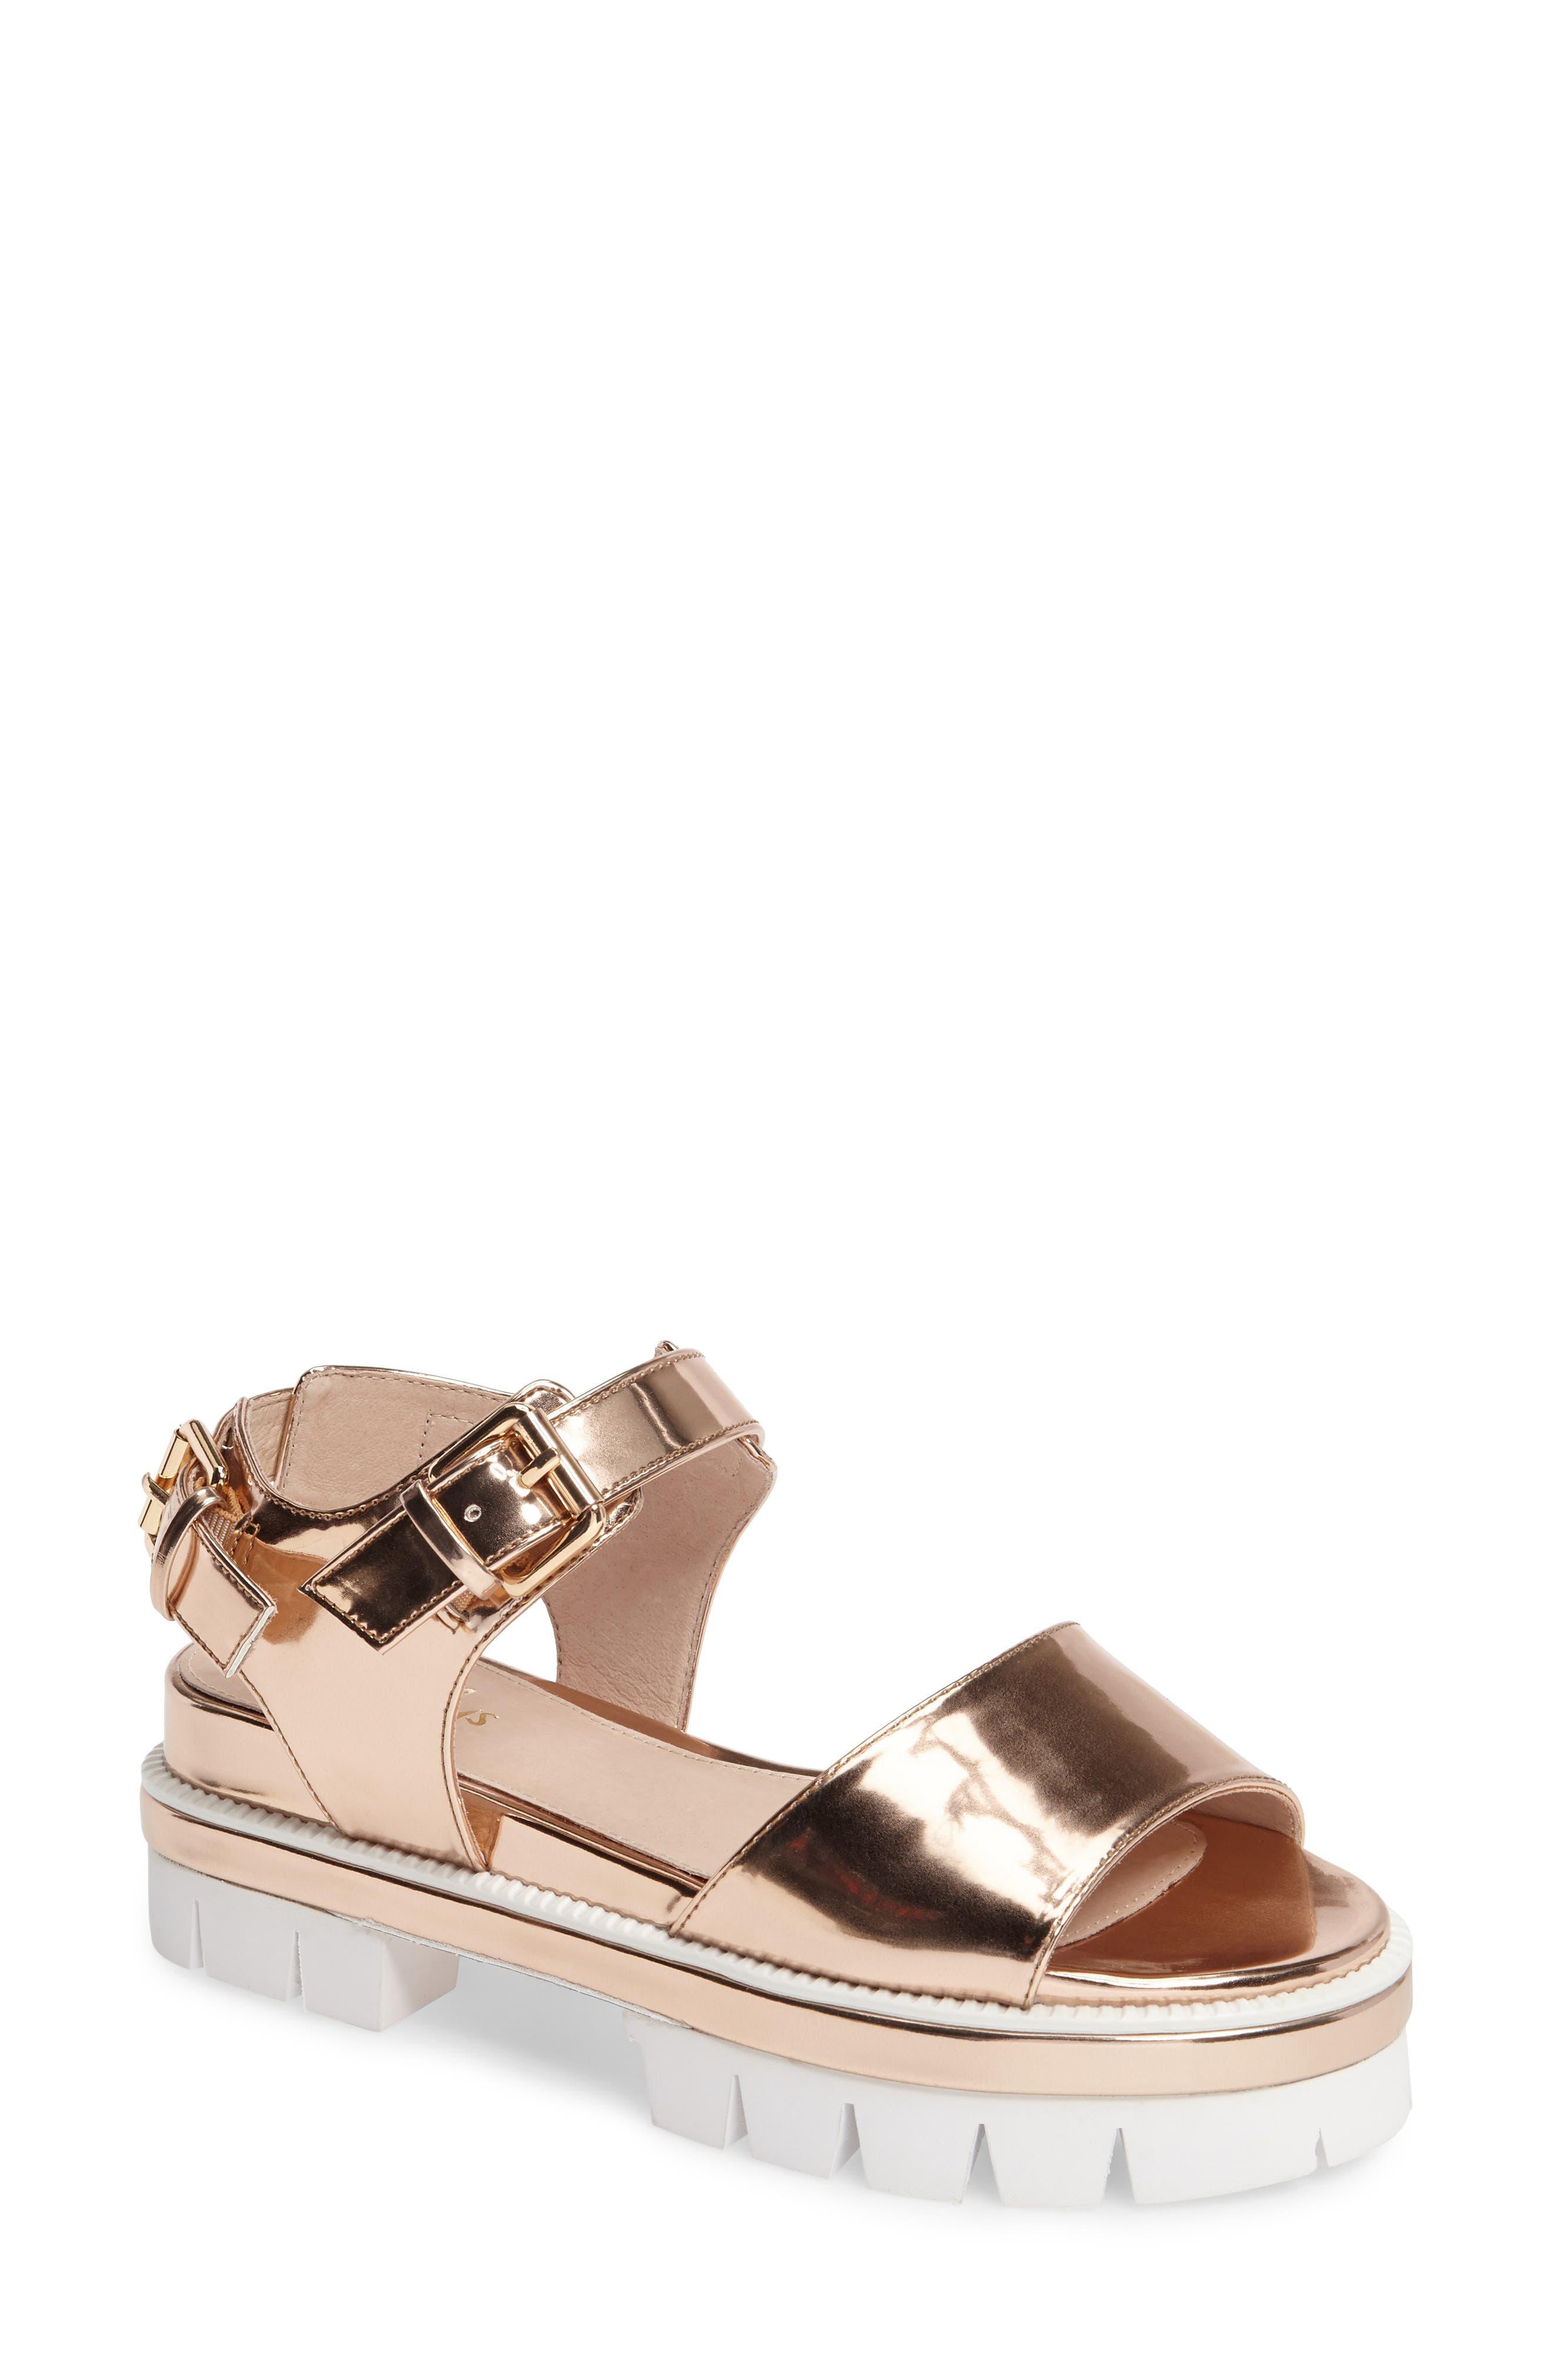 Main Image - Shellys London Dita Platform Sandal (Women)